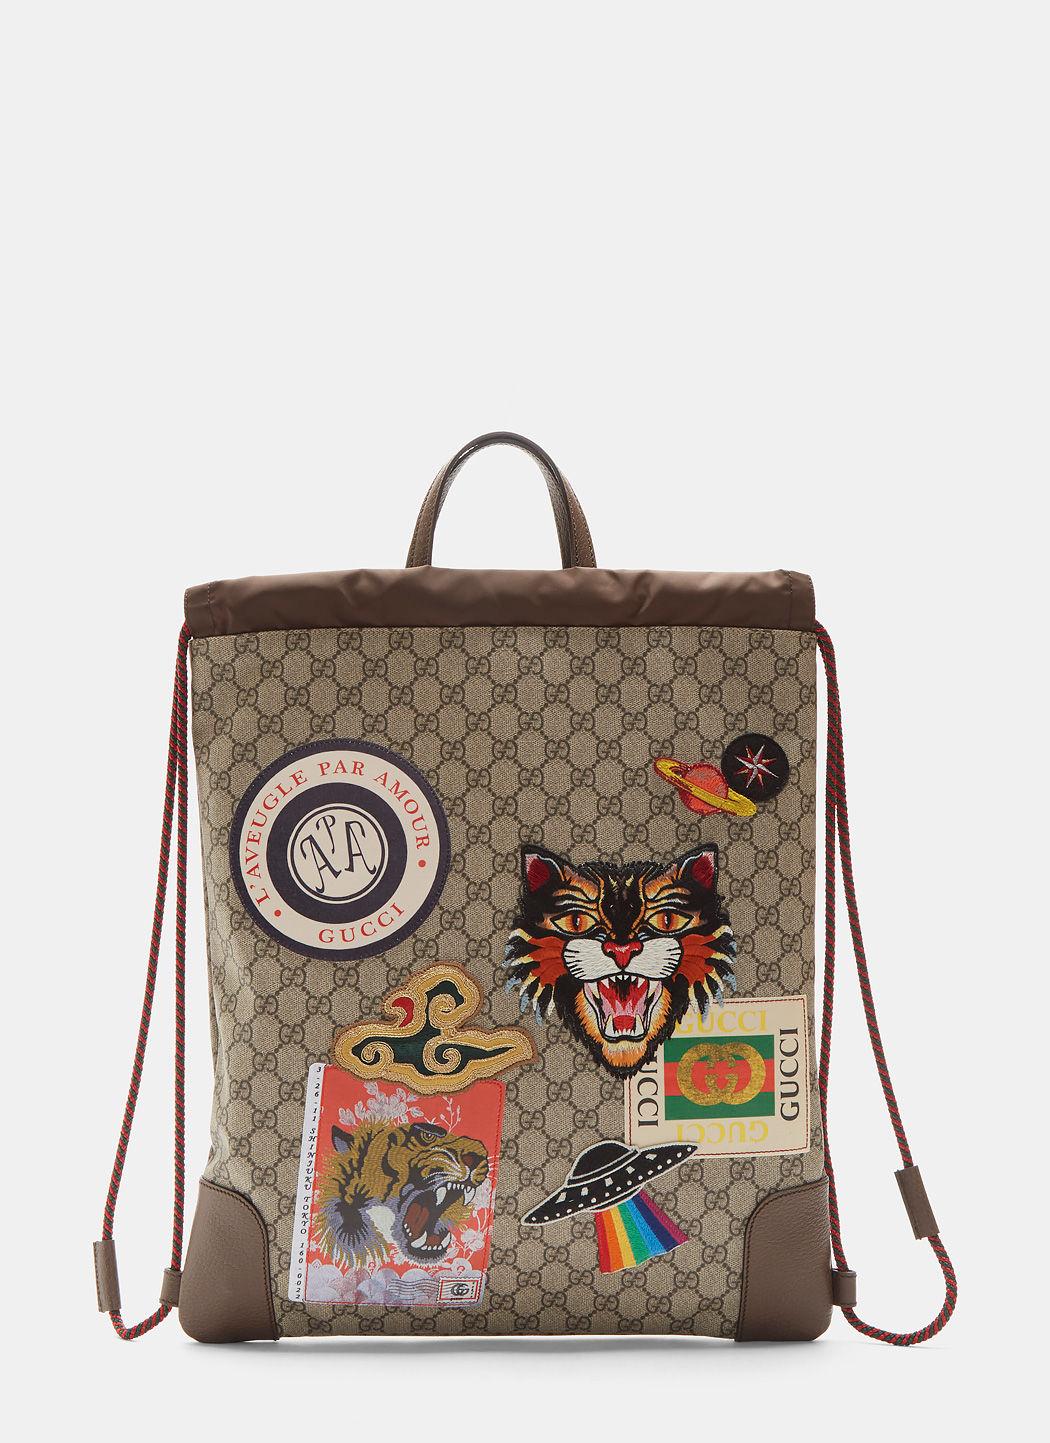 Gucci Courrier Soft Gg Supreme Drawstring Backpack In Neutrals ... 4168f6e5a131e